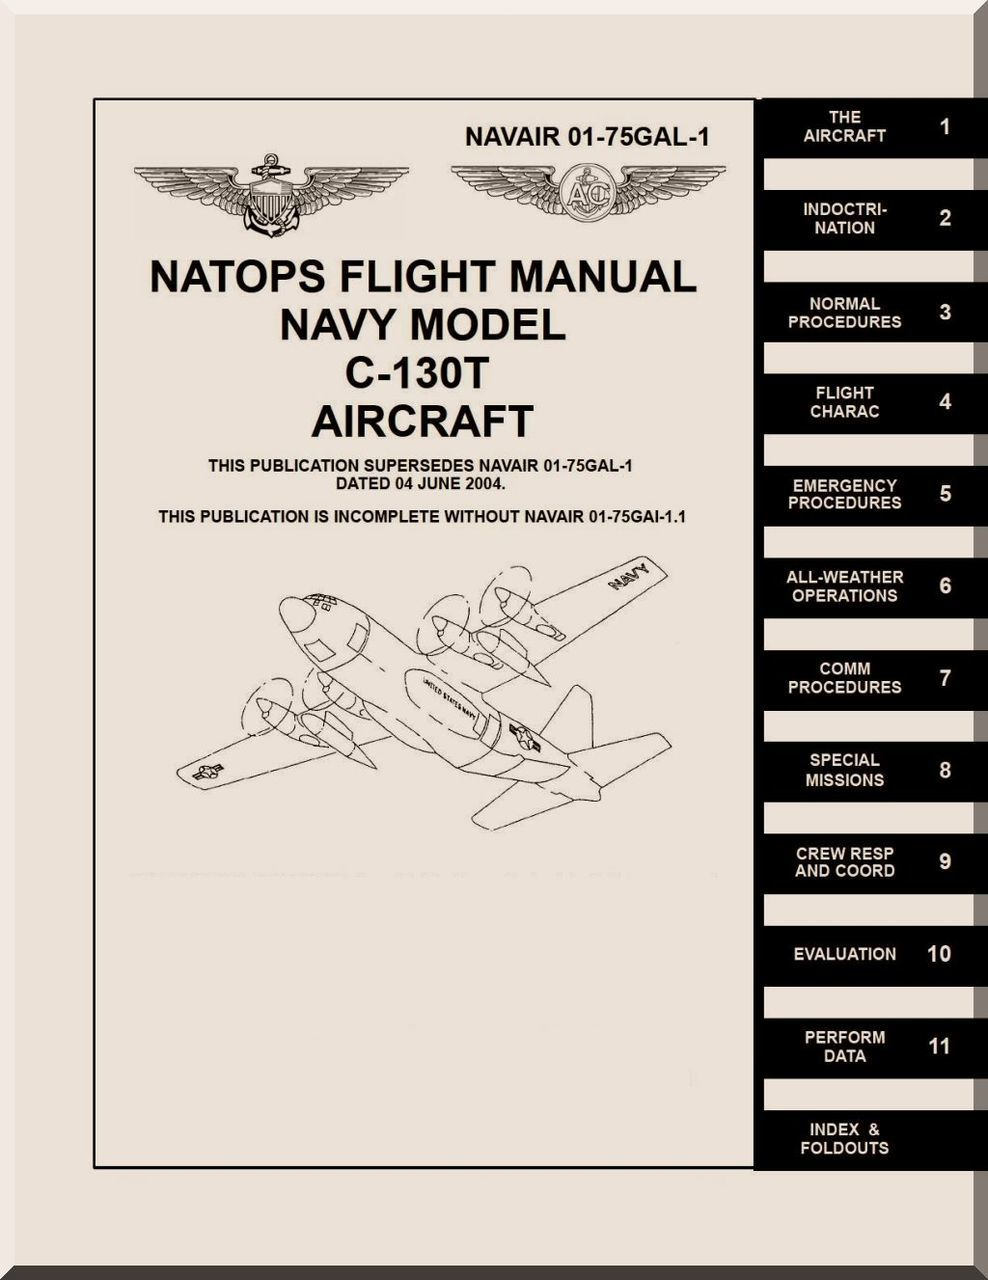 Lockheed C-130 T Aircraft Flight Manual, NAVAIR 01-75GAL-1 - Aircraft  Reports - Manuals Aircraft Helicopter Engines Propellers Blueprints  Publications